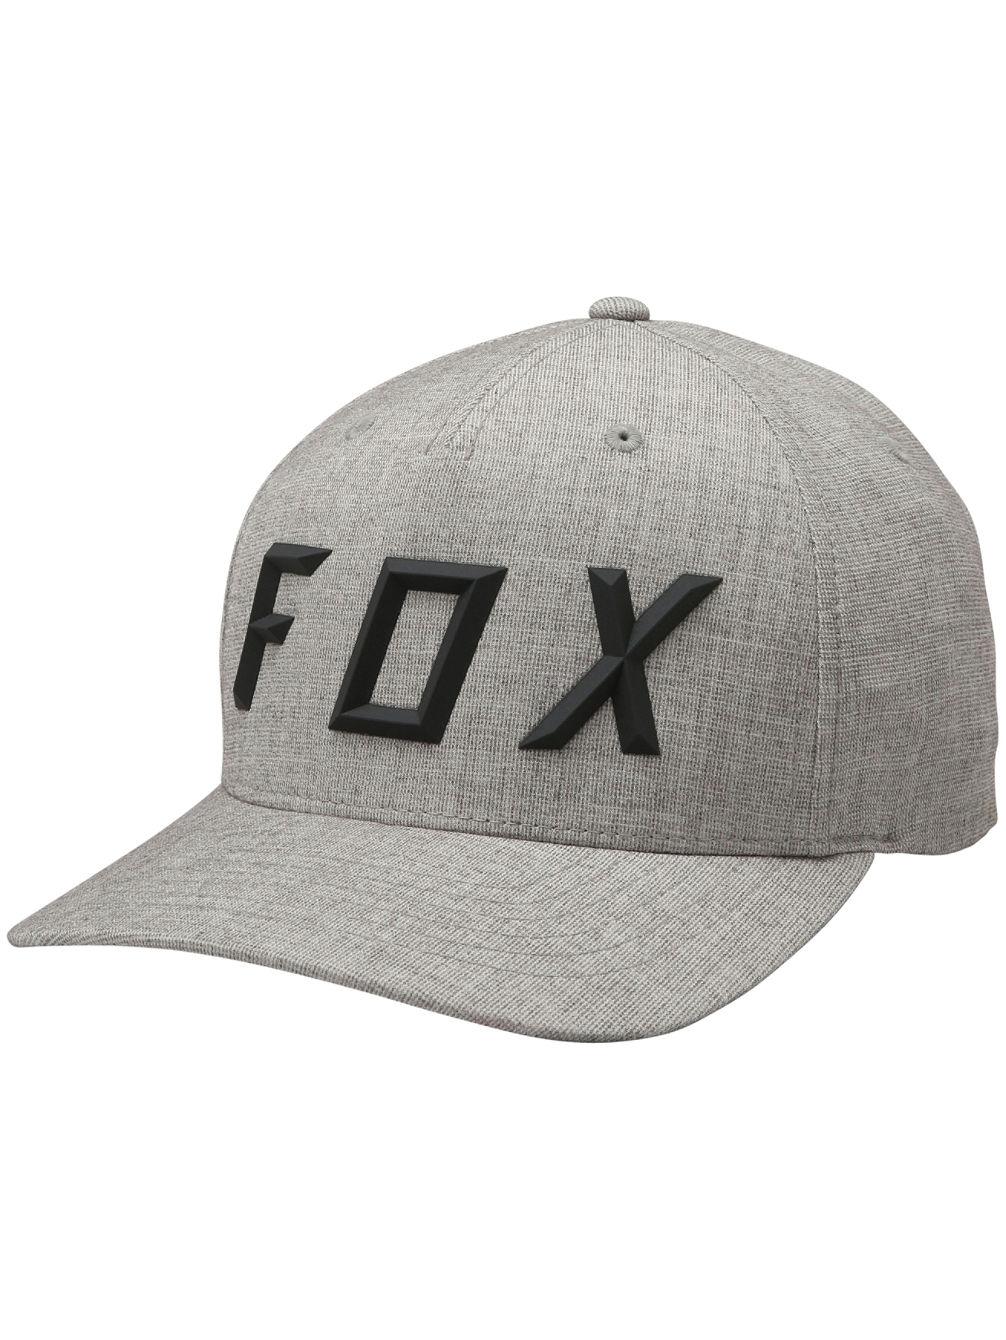 b84cdf63b4efd Buy Fox Sonic Moth Flexfit Cap online at blue-tomato.com